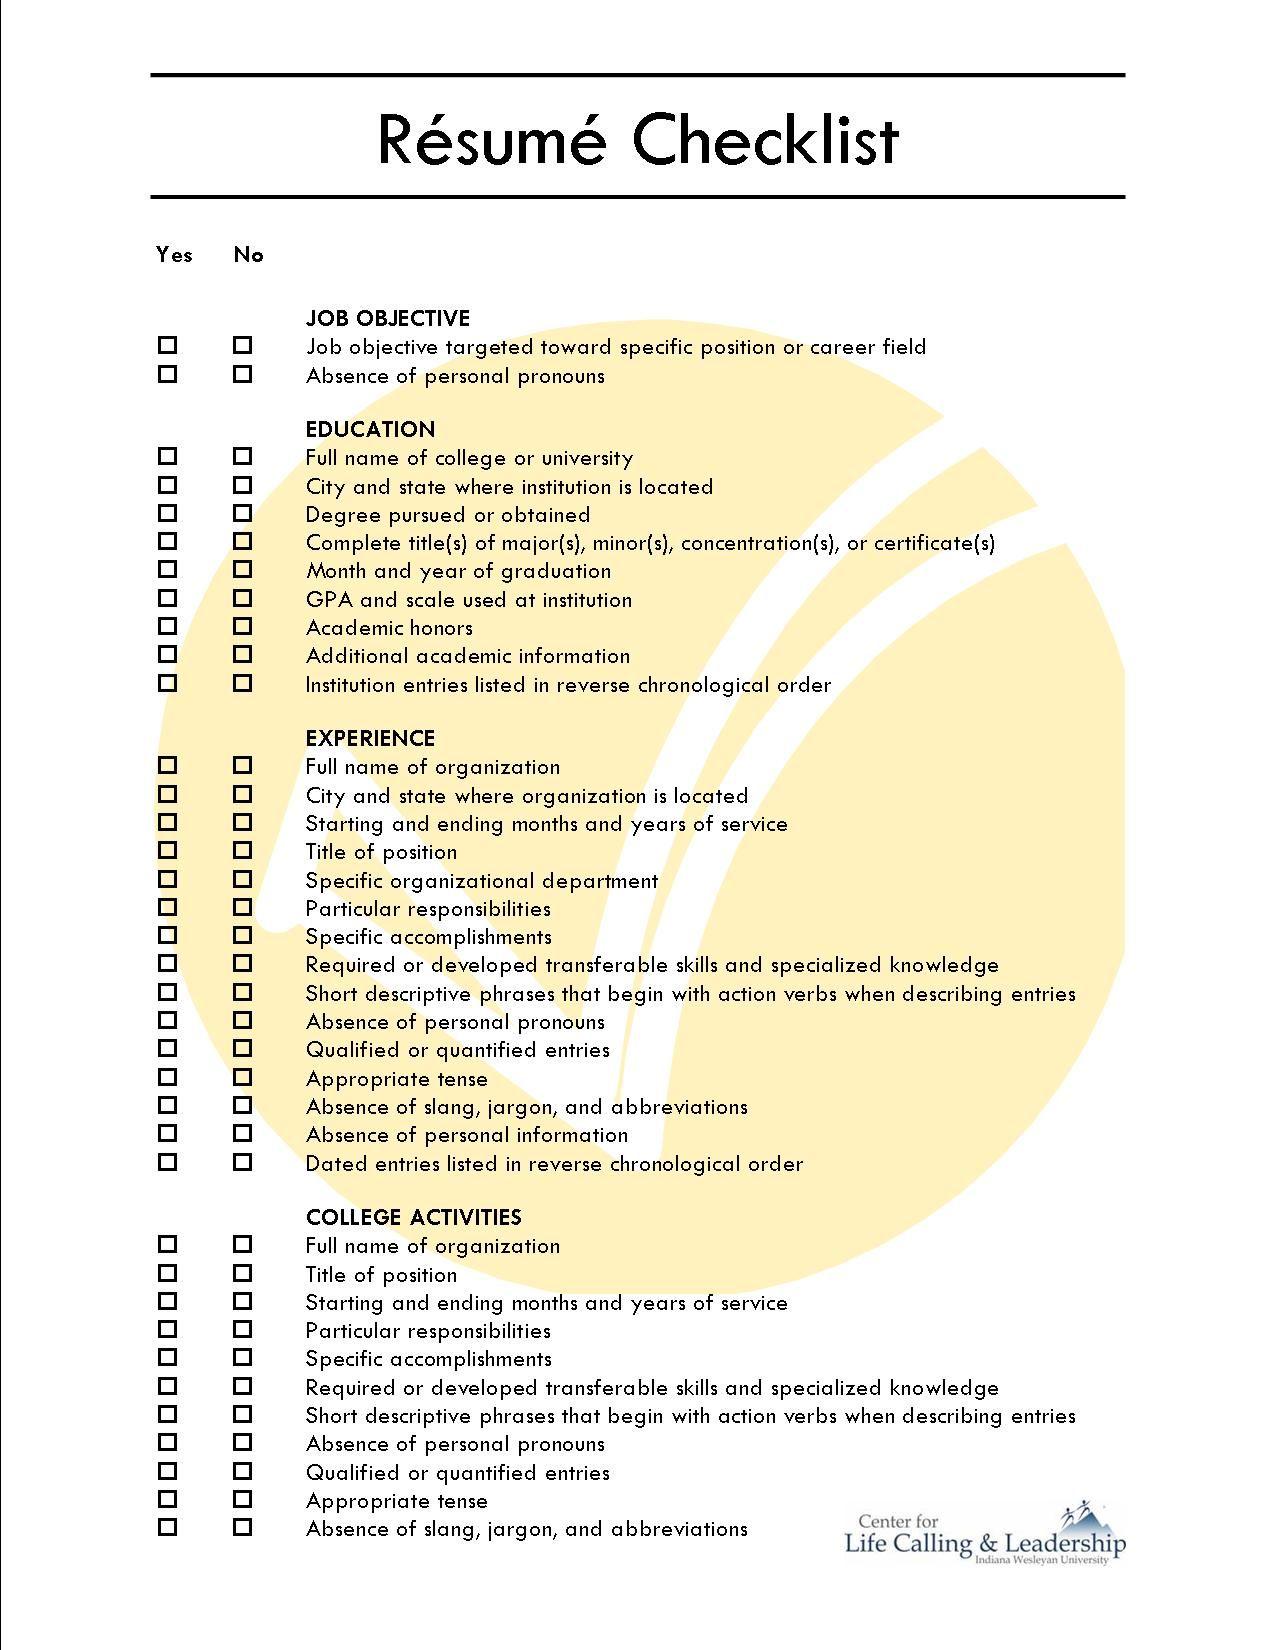 Comprehensive Resume Checklist Sample Comprehensive Resume Checklist Sample Will Give Ideas And Strategies To Deve Resume Template Free Teacher Resume Resume